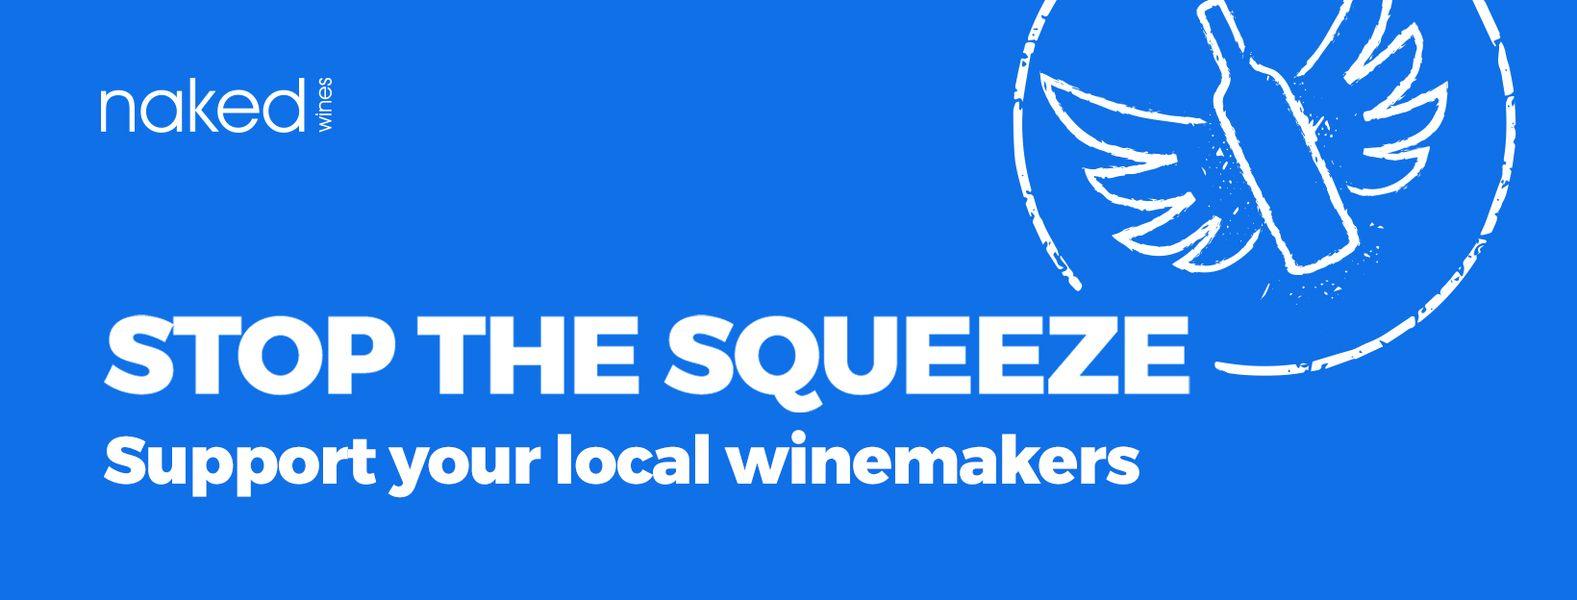 Naked Wines Header Image